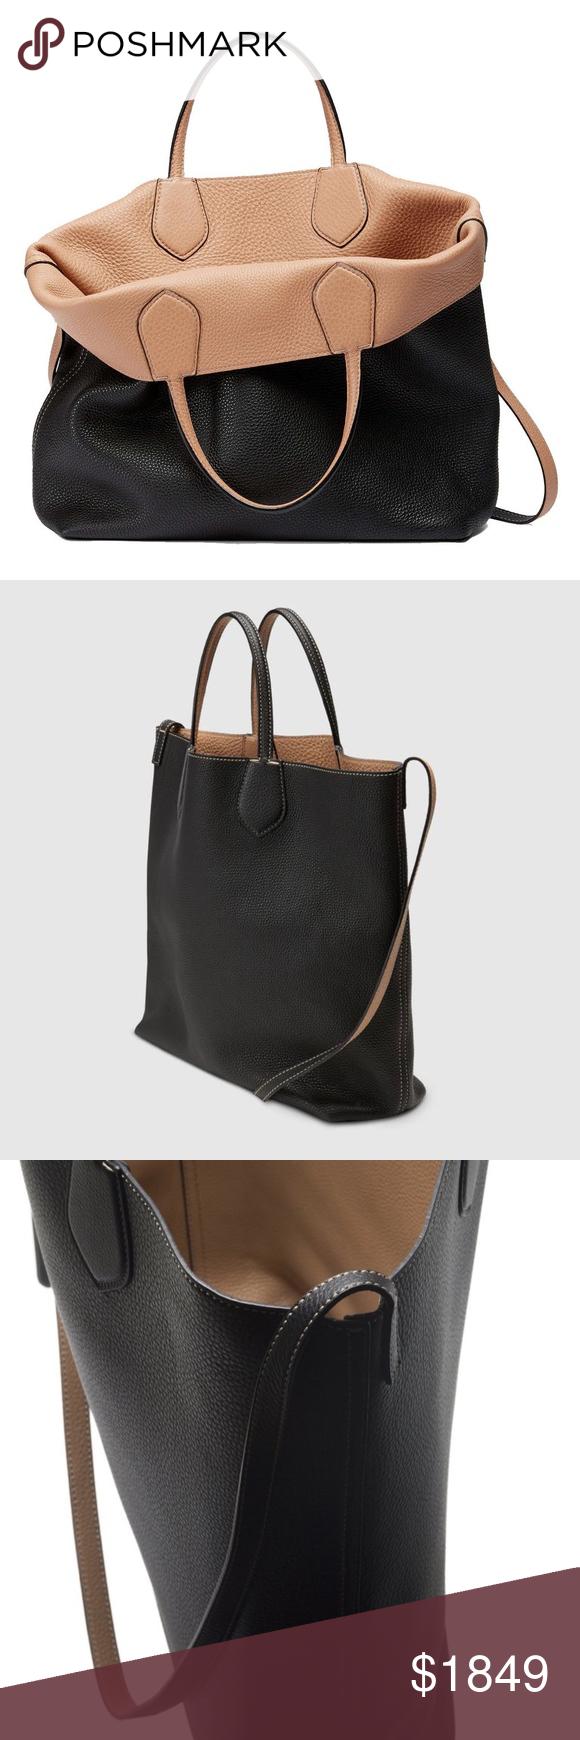 7a5572918895 Gucci Ramble Handbag Reversible Leather Shopping Gucci Ramble Reversible  Leather Shopping Tote Bag with Shoulder Strap